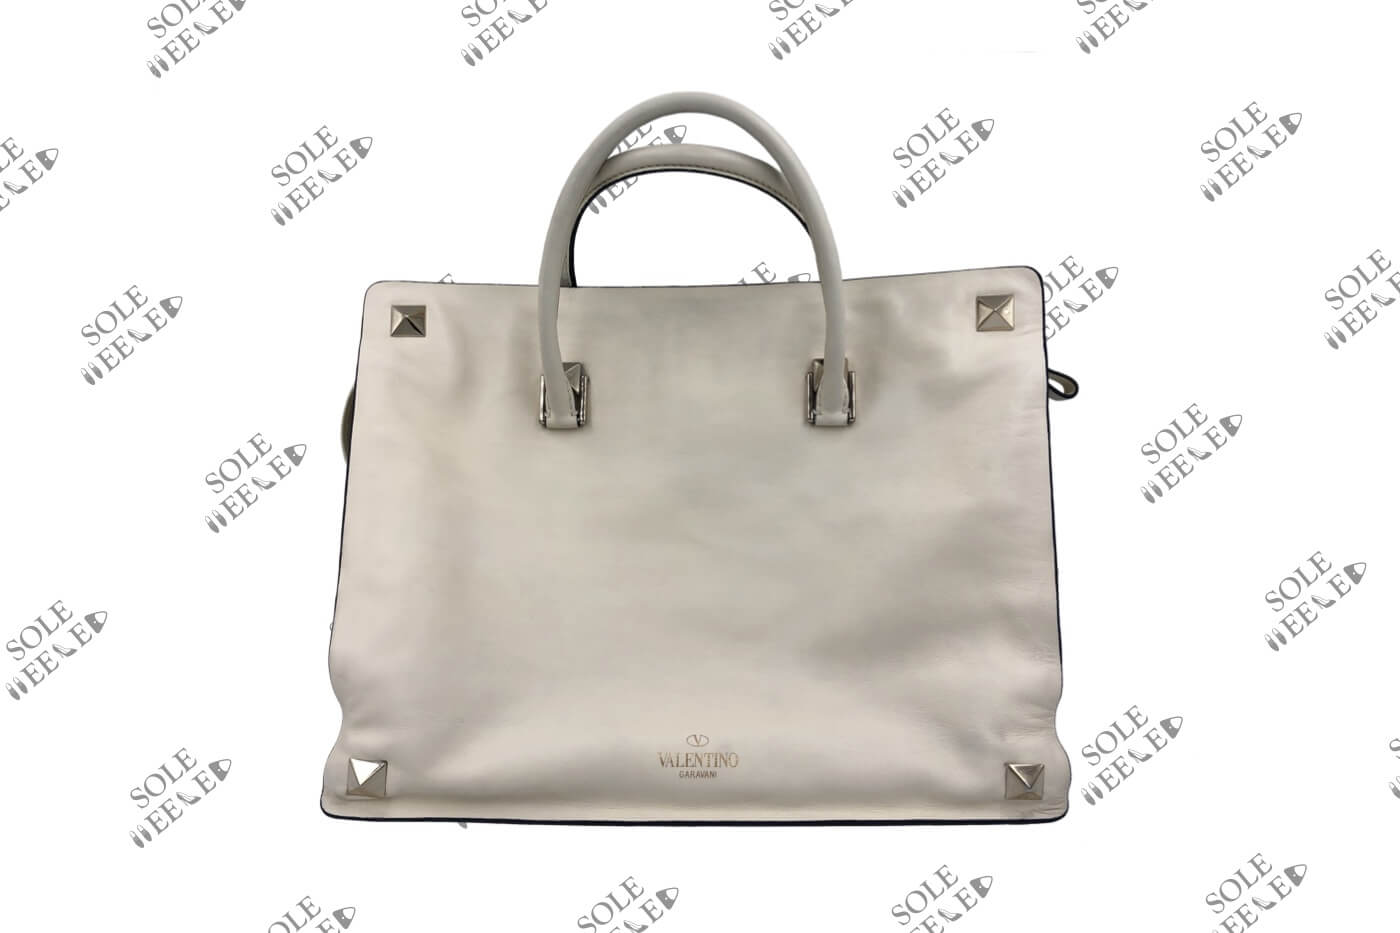 Valentino Garavani Handbag Restoration